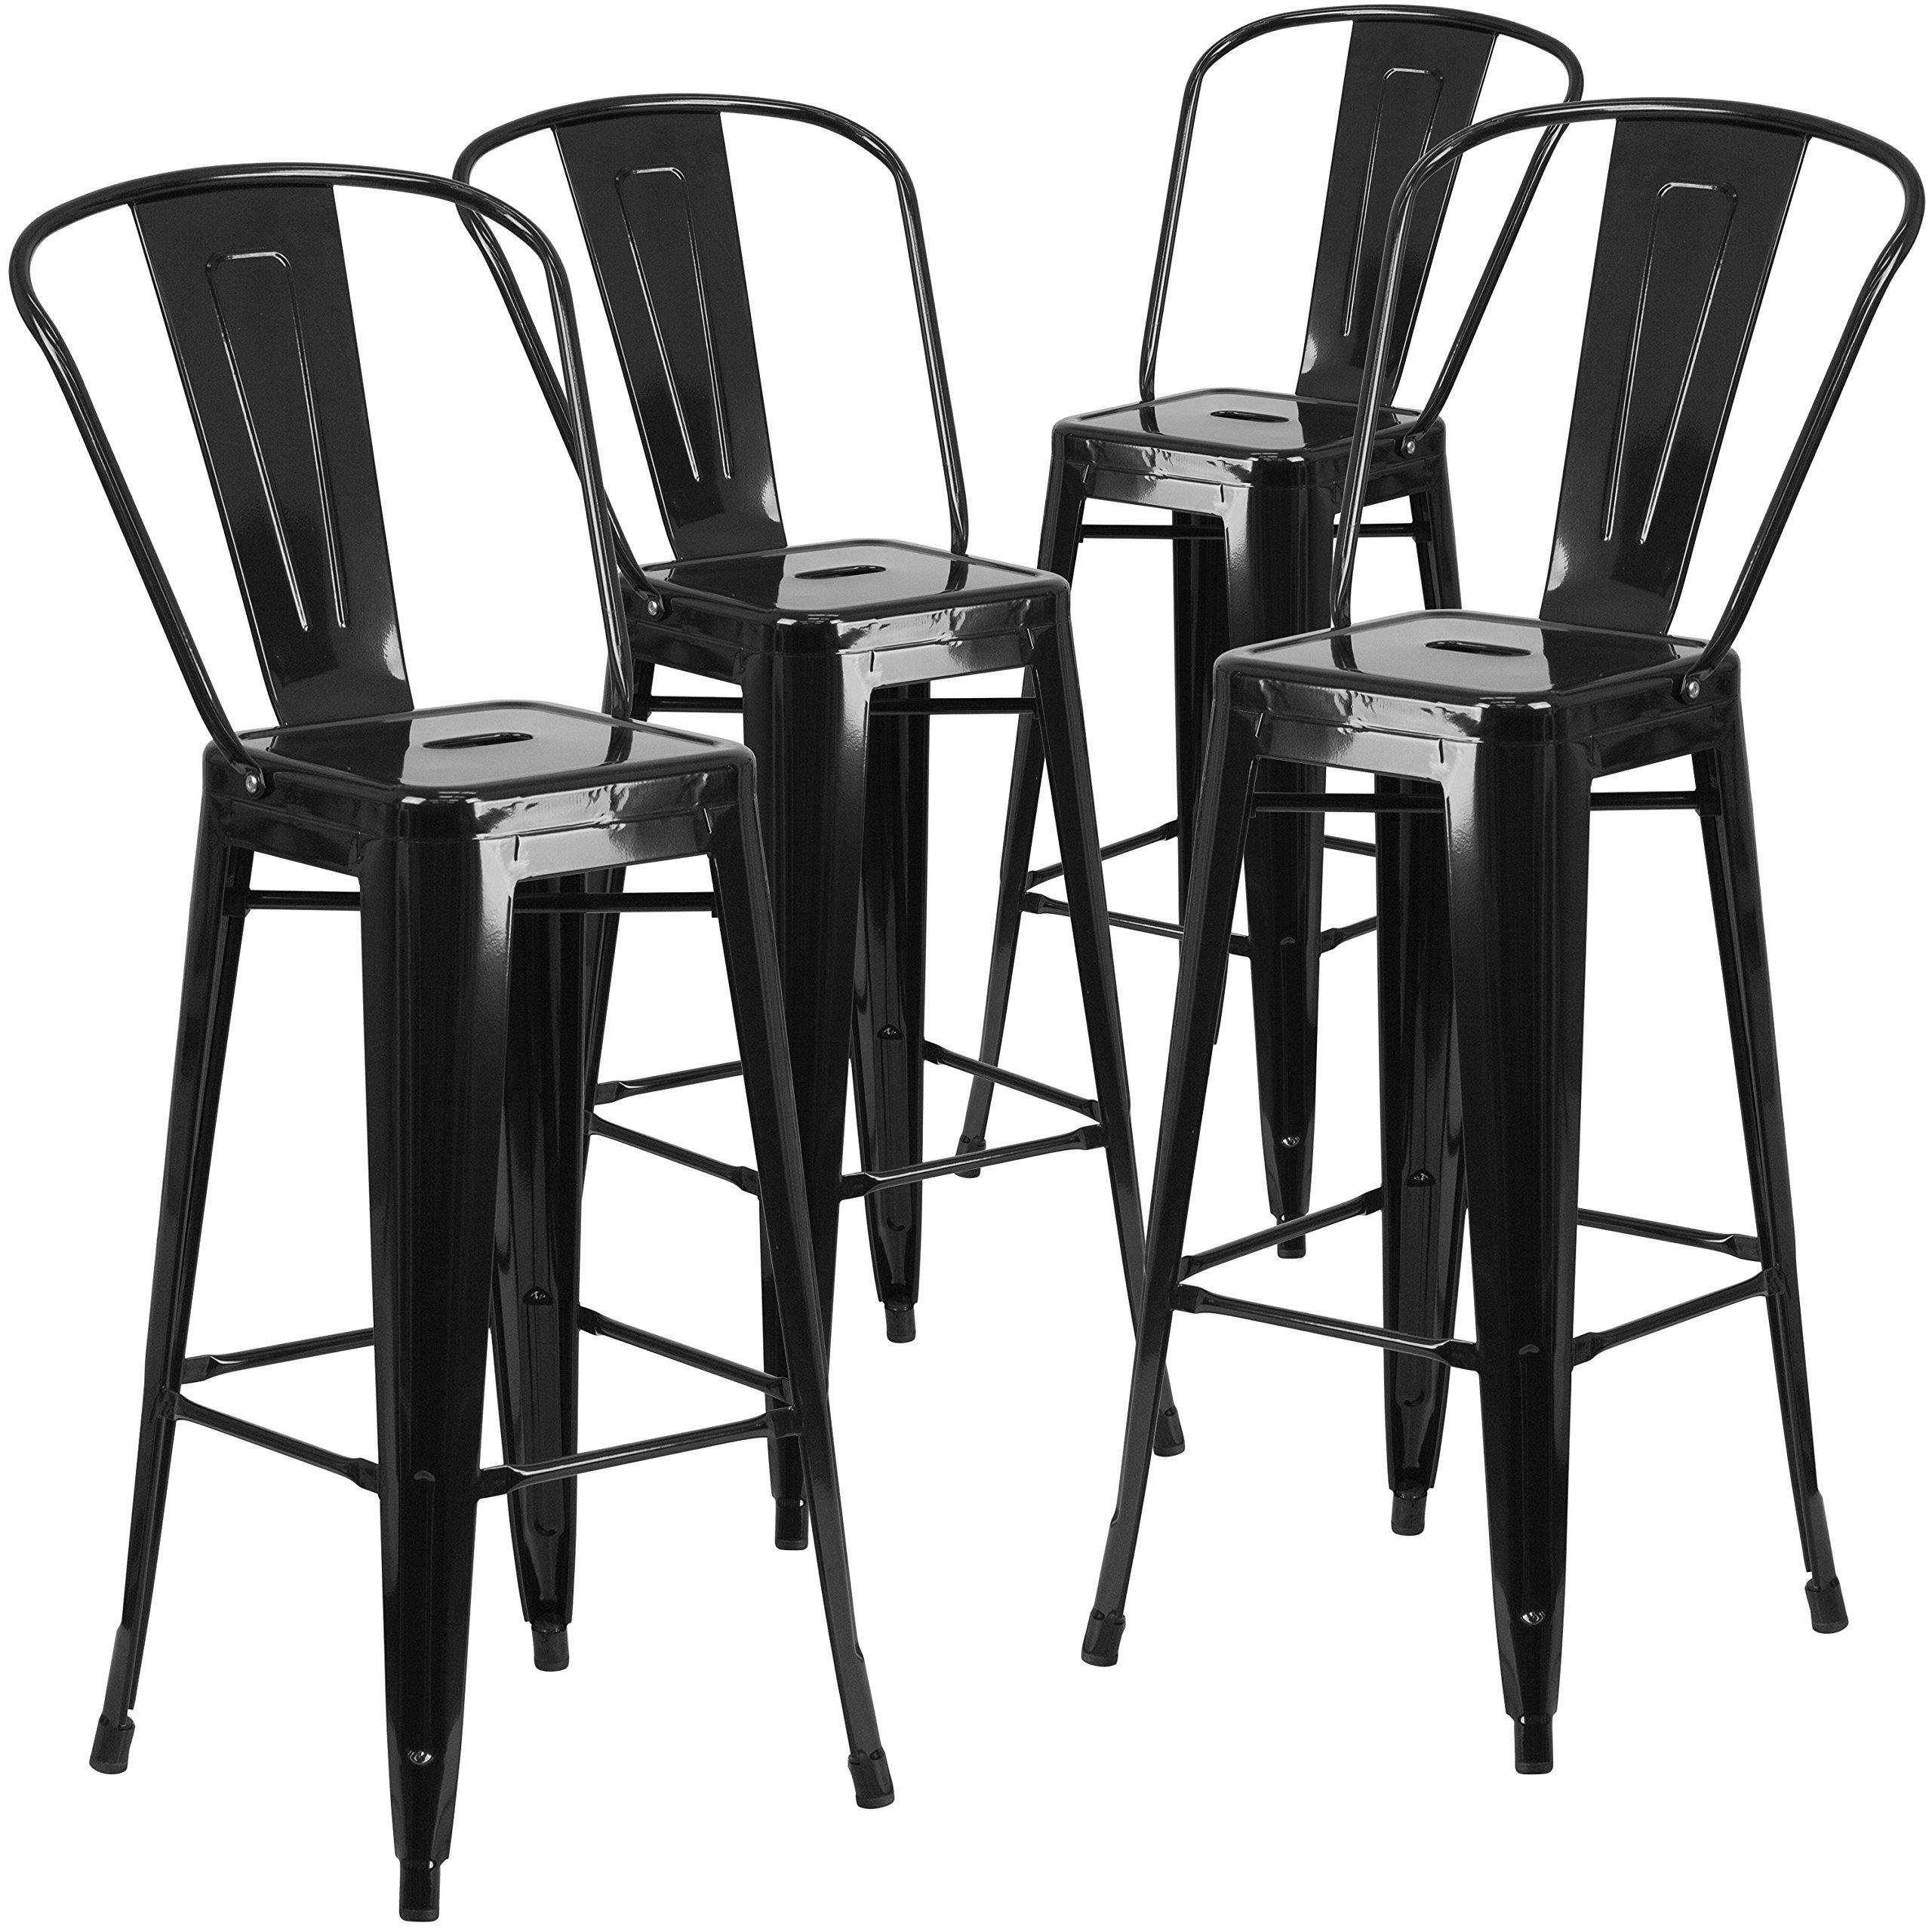 Flash Furniture 4 Pk. 30'' High Black Metal Indoor-Outdoor Barstool with Back